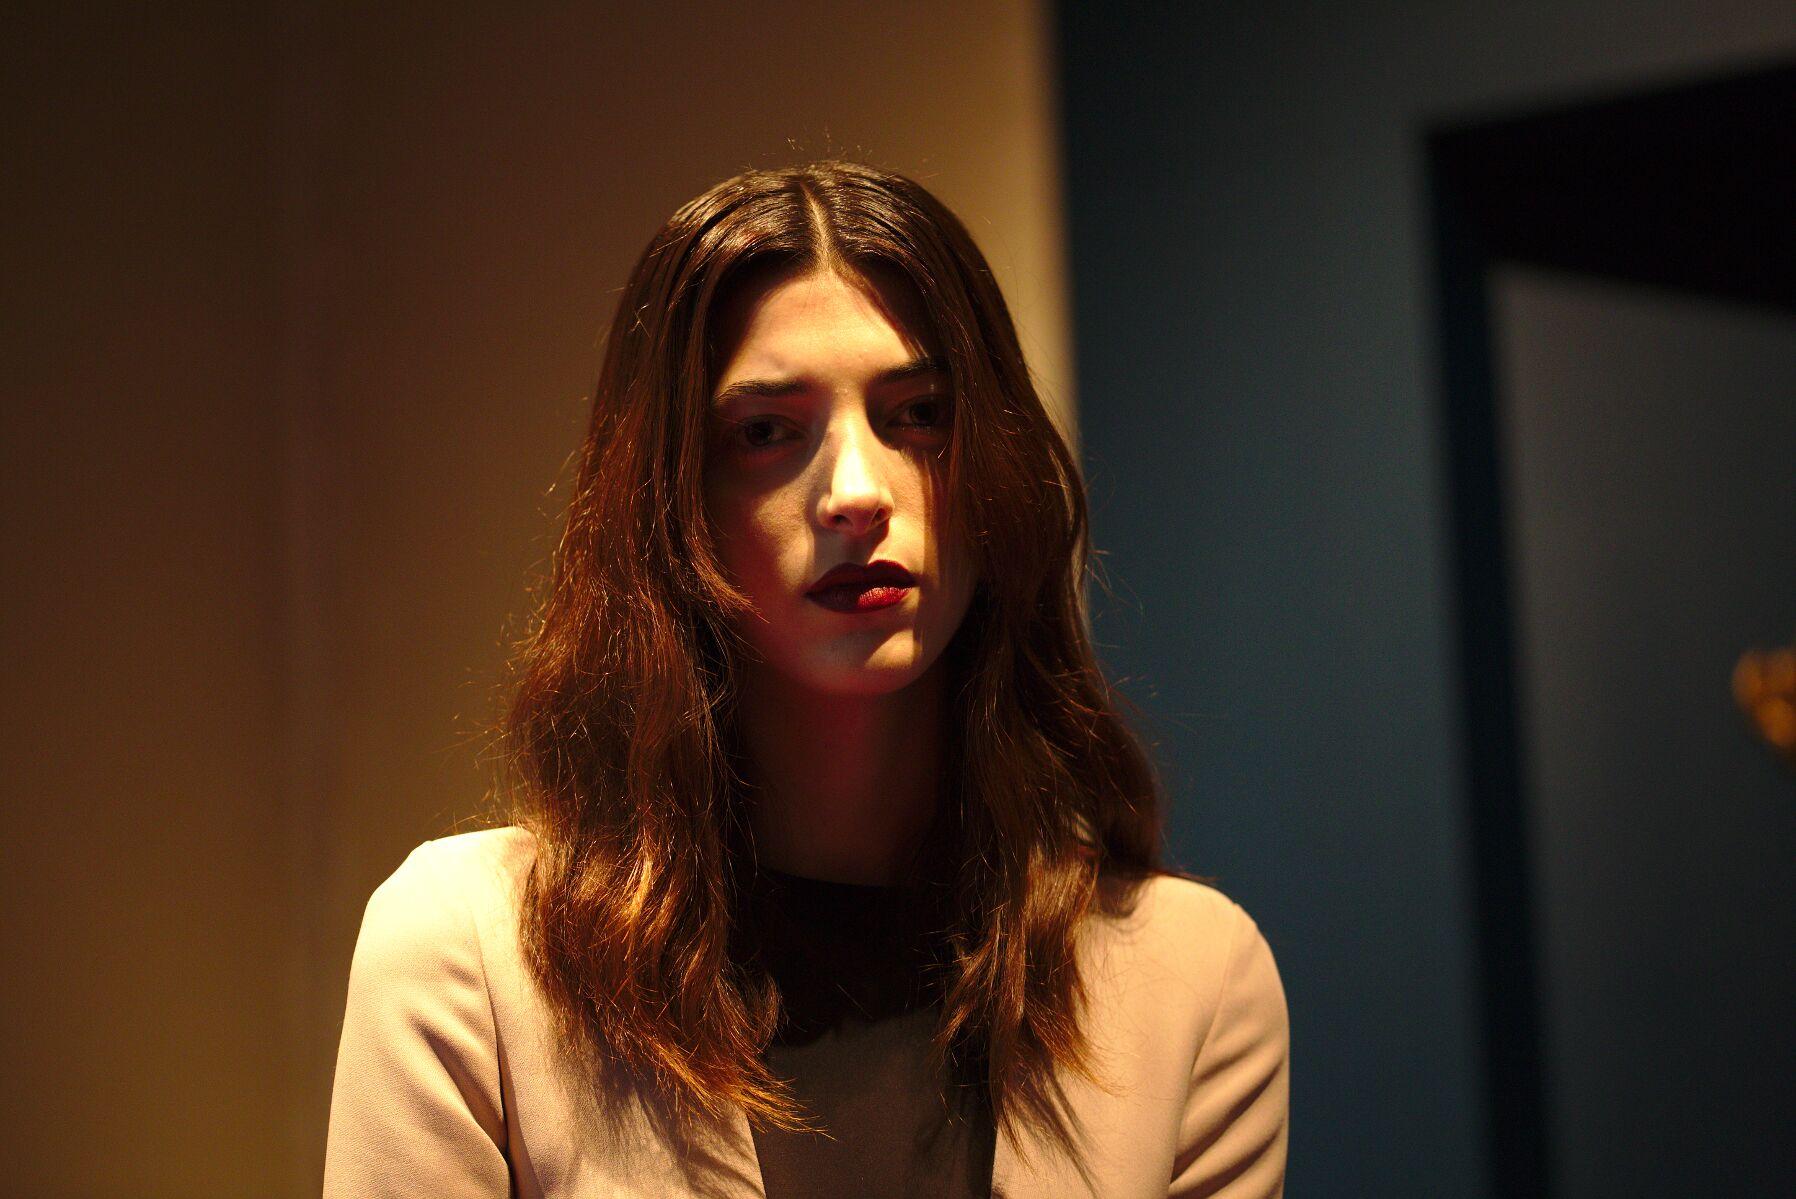 2014 Barbara Casasola Model